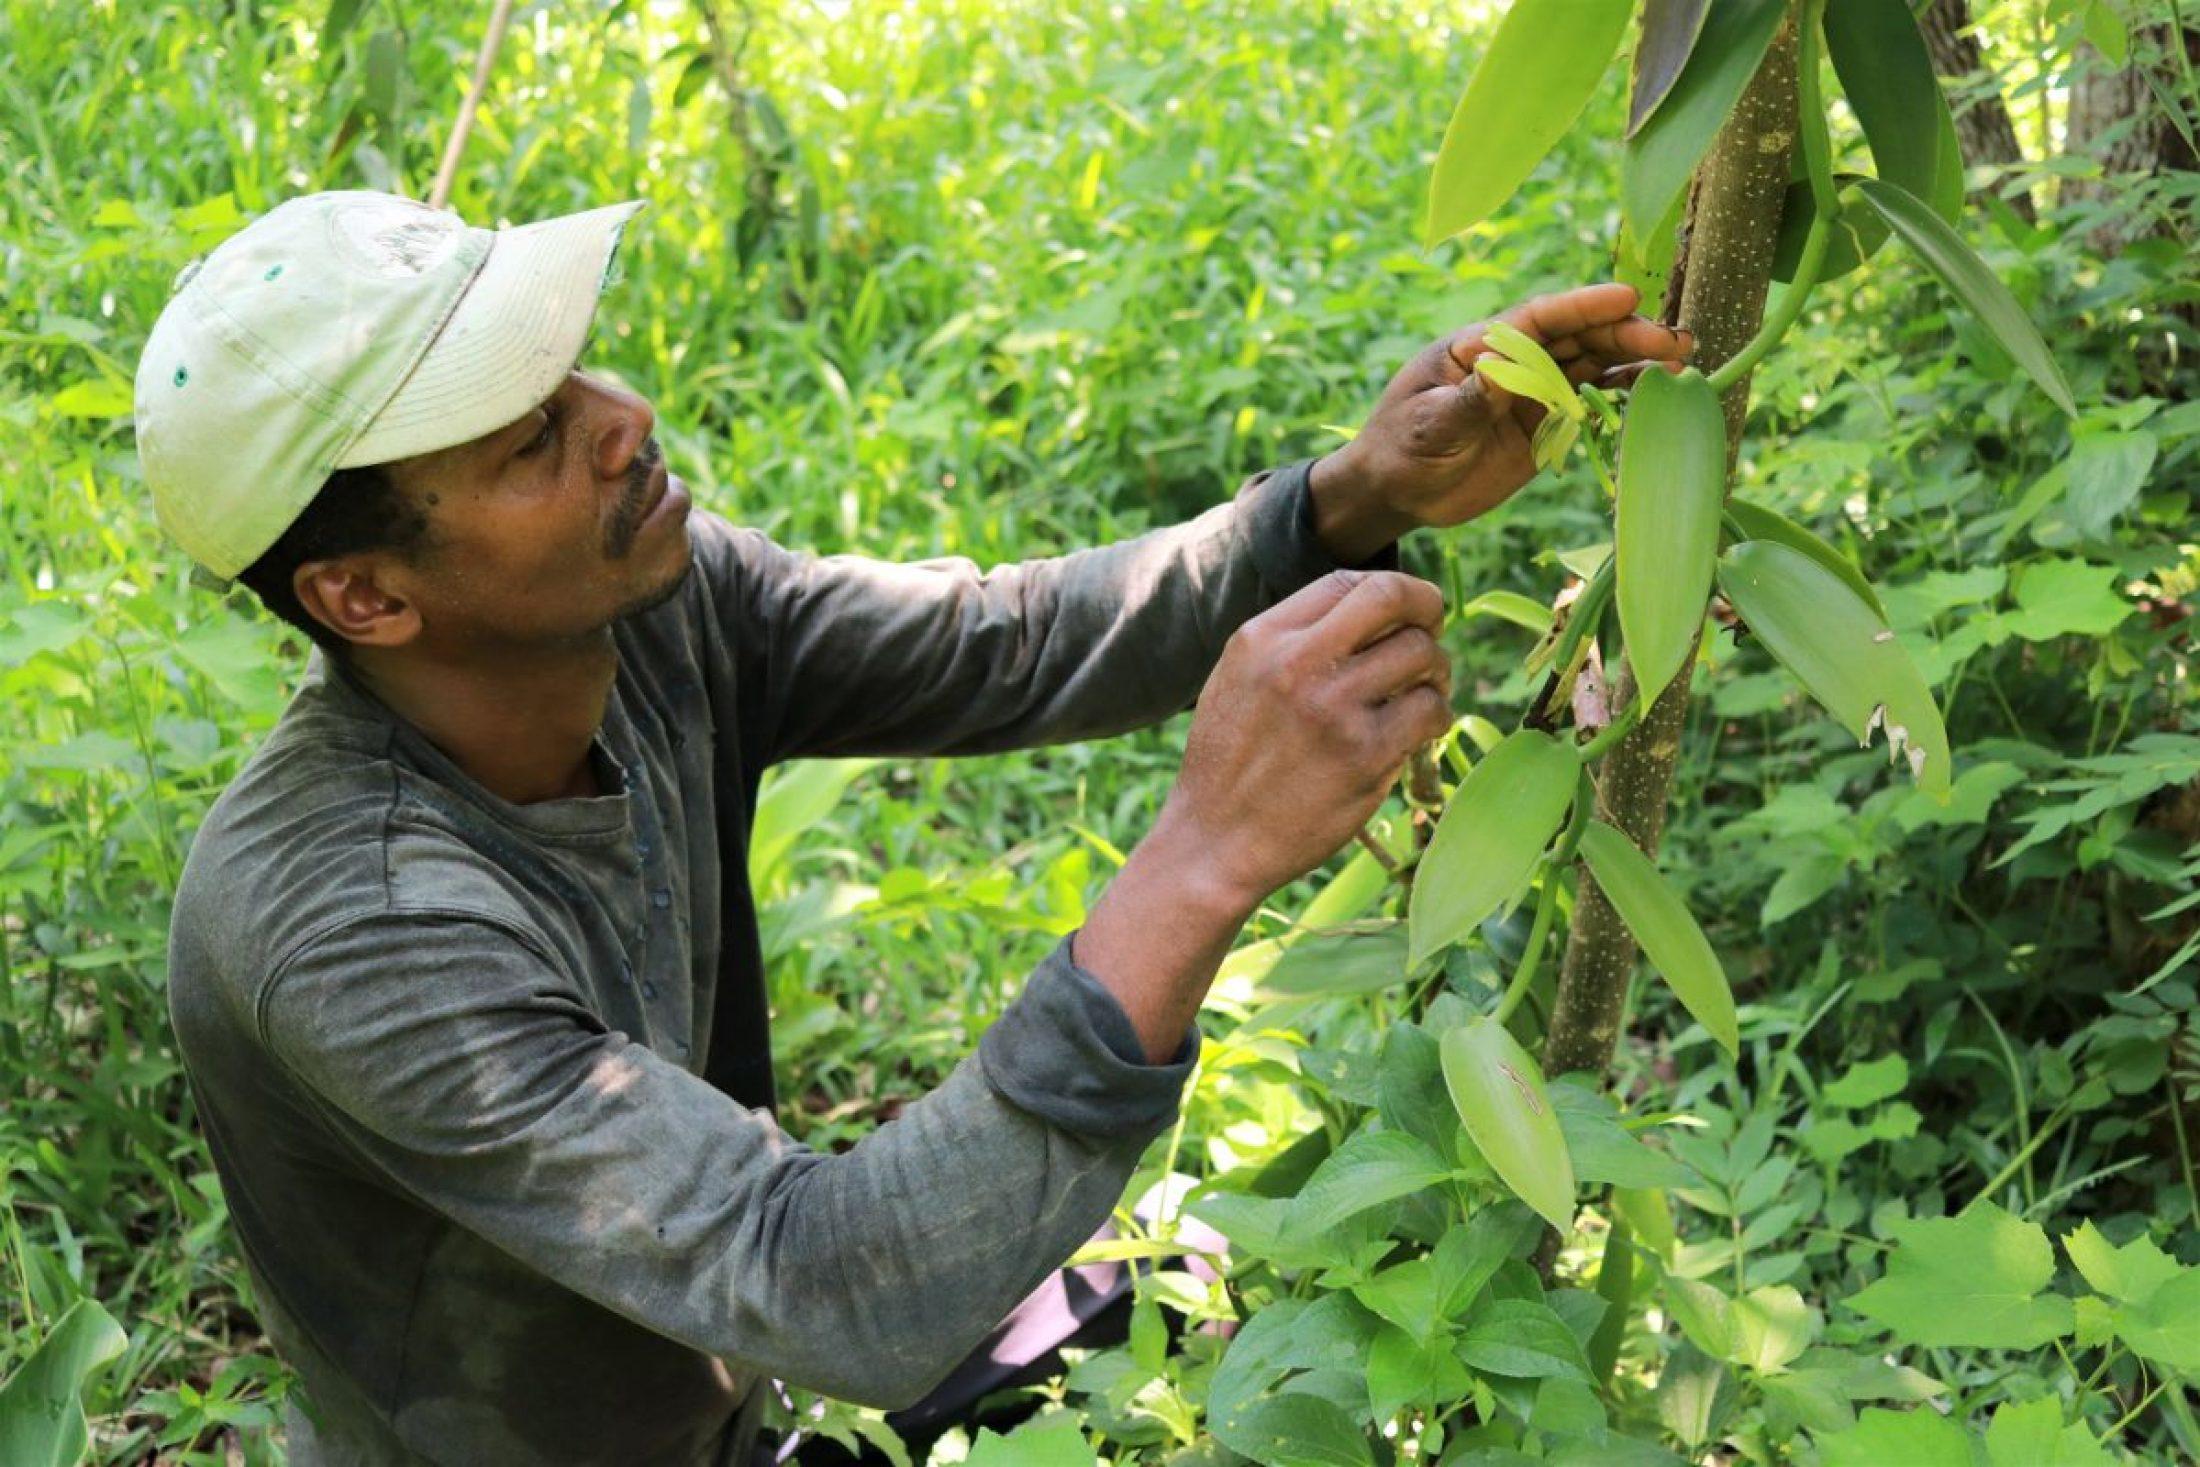 Vanilla farmer Emmanuel Rajao pollinates the flowers on his vines by hand